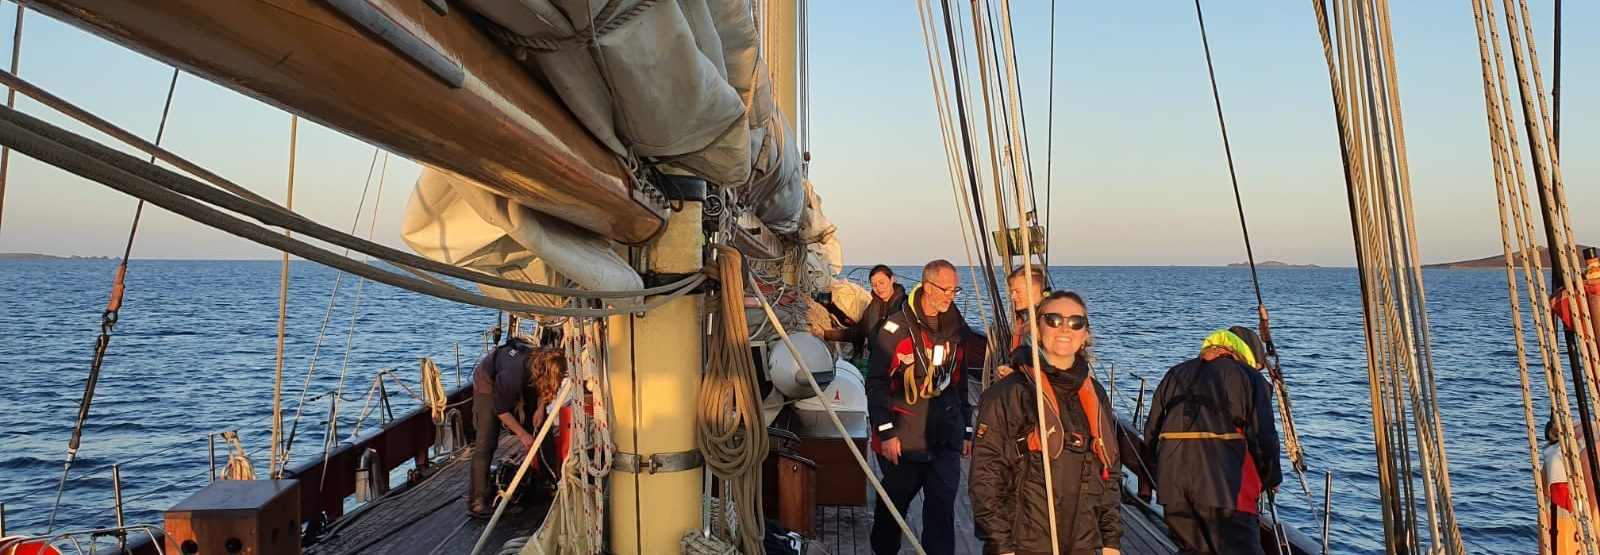 Outer Hebrides Sailing Adventure